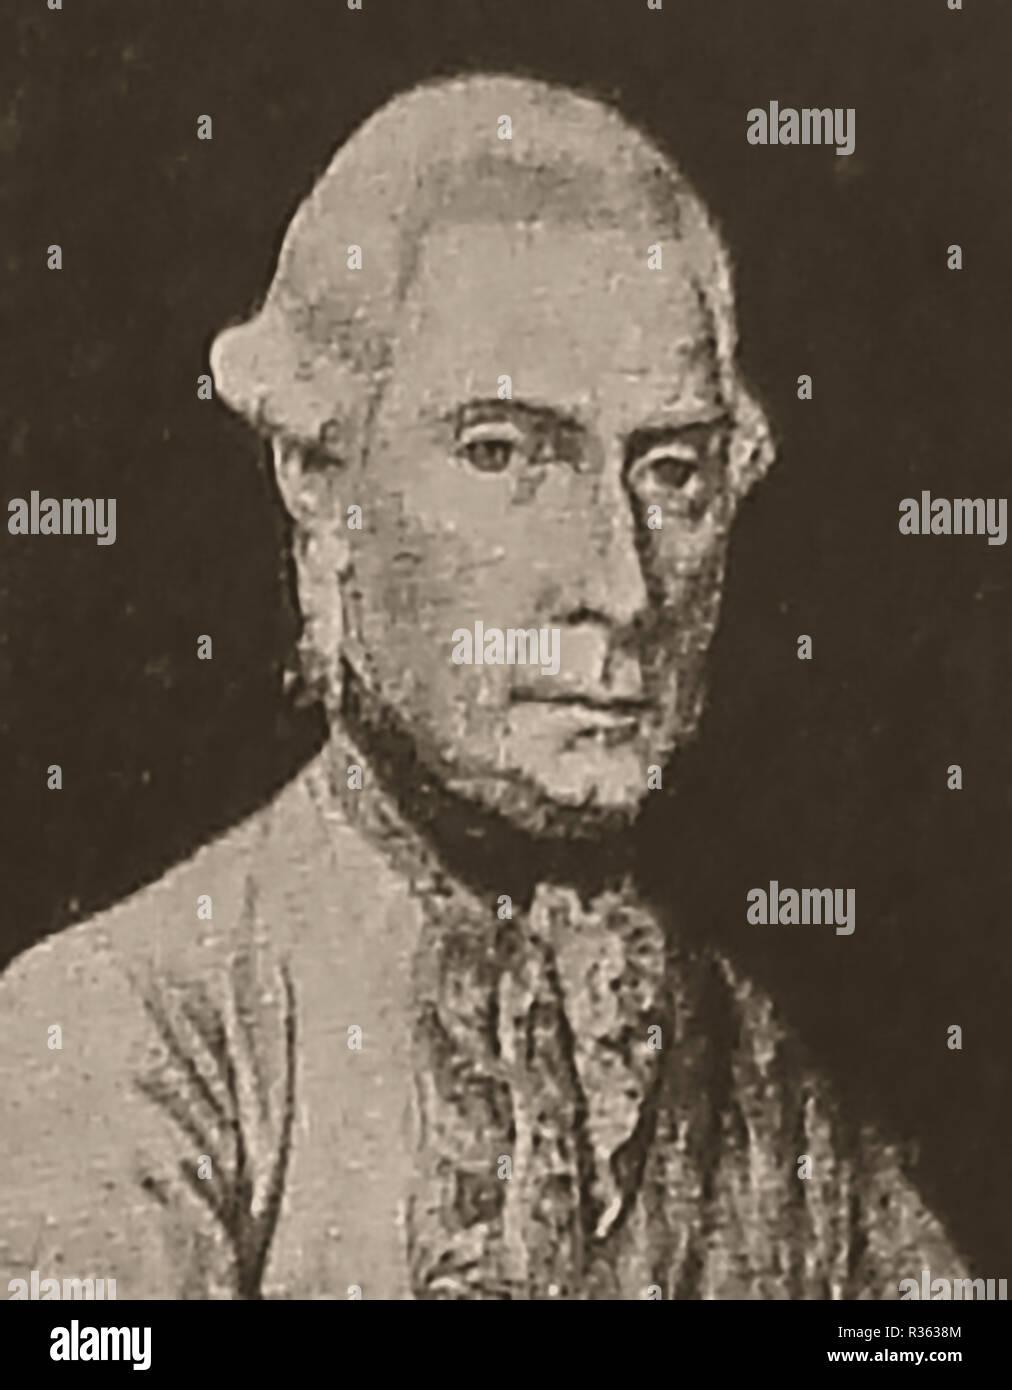 A portrait of  Ernst Gideon Freiherr von Laudon (Laudohn or Loudon) 1717-1790. Military Generalfeldmarschall and  Austrian Generalisimo -Military governor of Habsburg Serbia - Stock Image